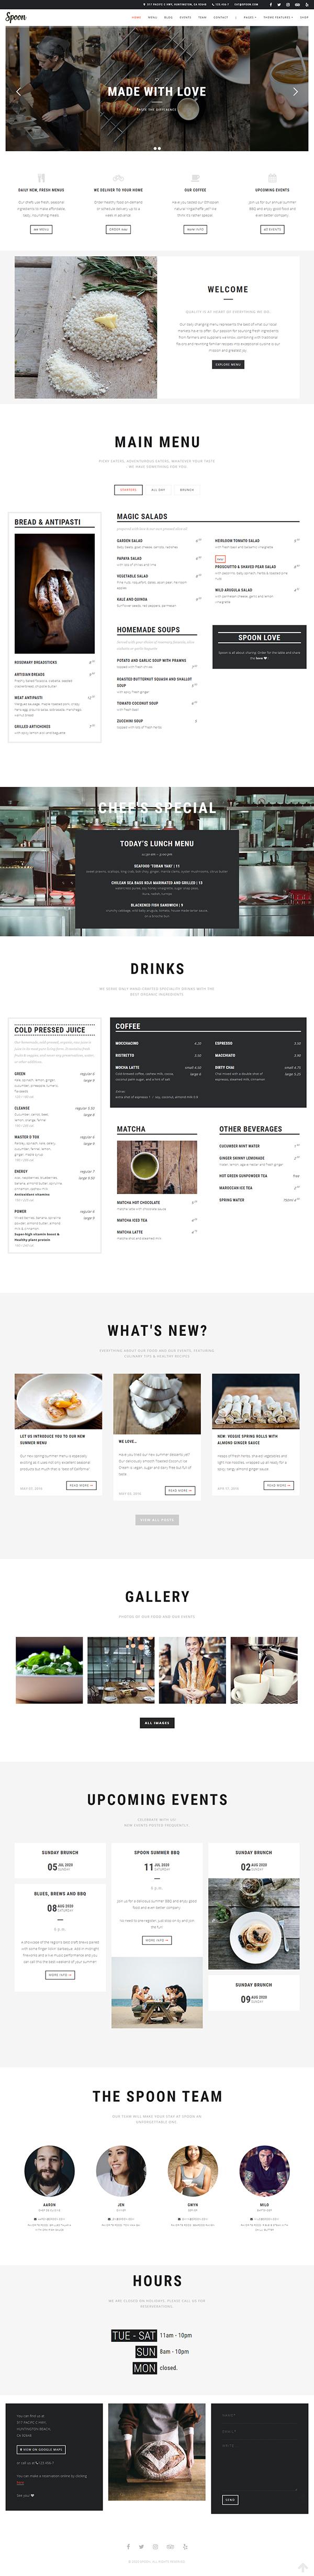 Spoon – a Premium Responsive Restaurant WordPress Theme